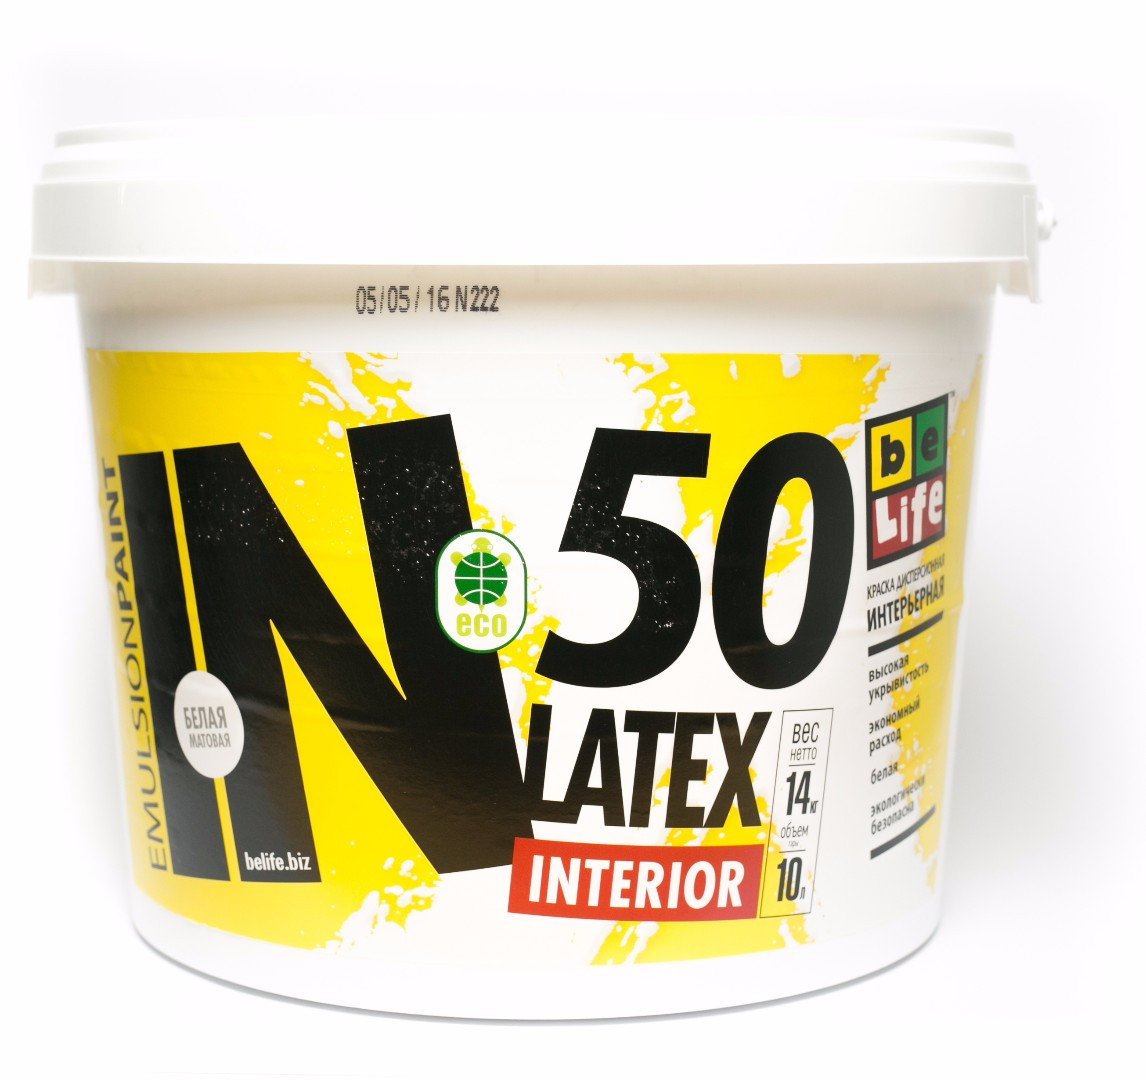 Интерьерная дисперсионная краска Latex Interior IN50, 10л